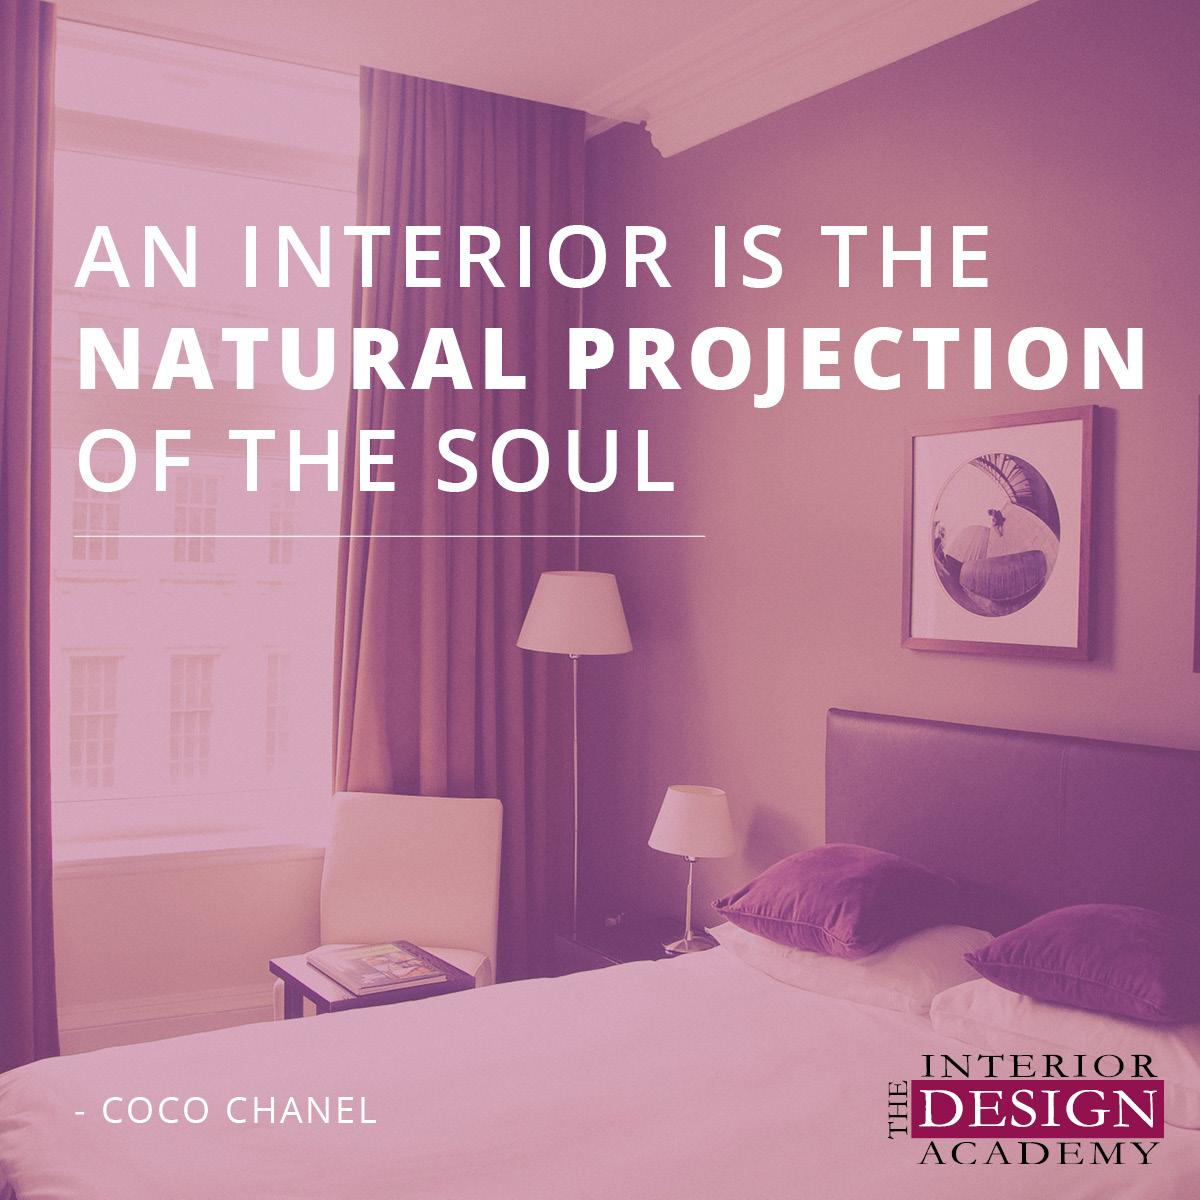 the interior design academy interior quotes